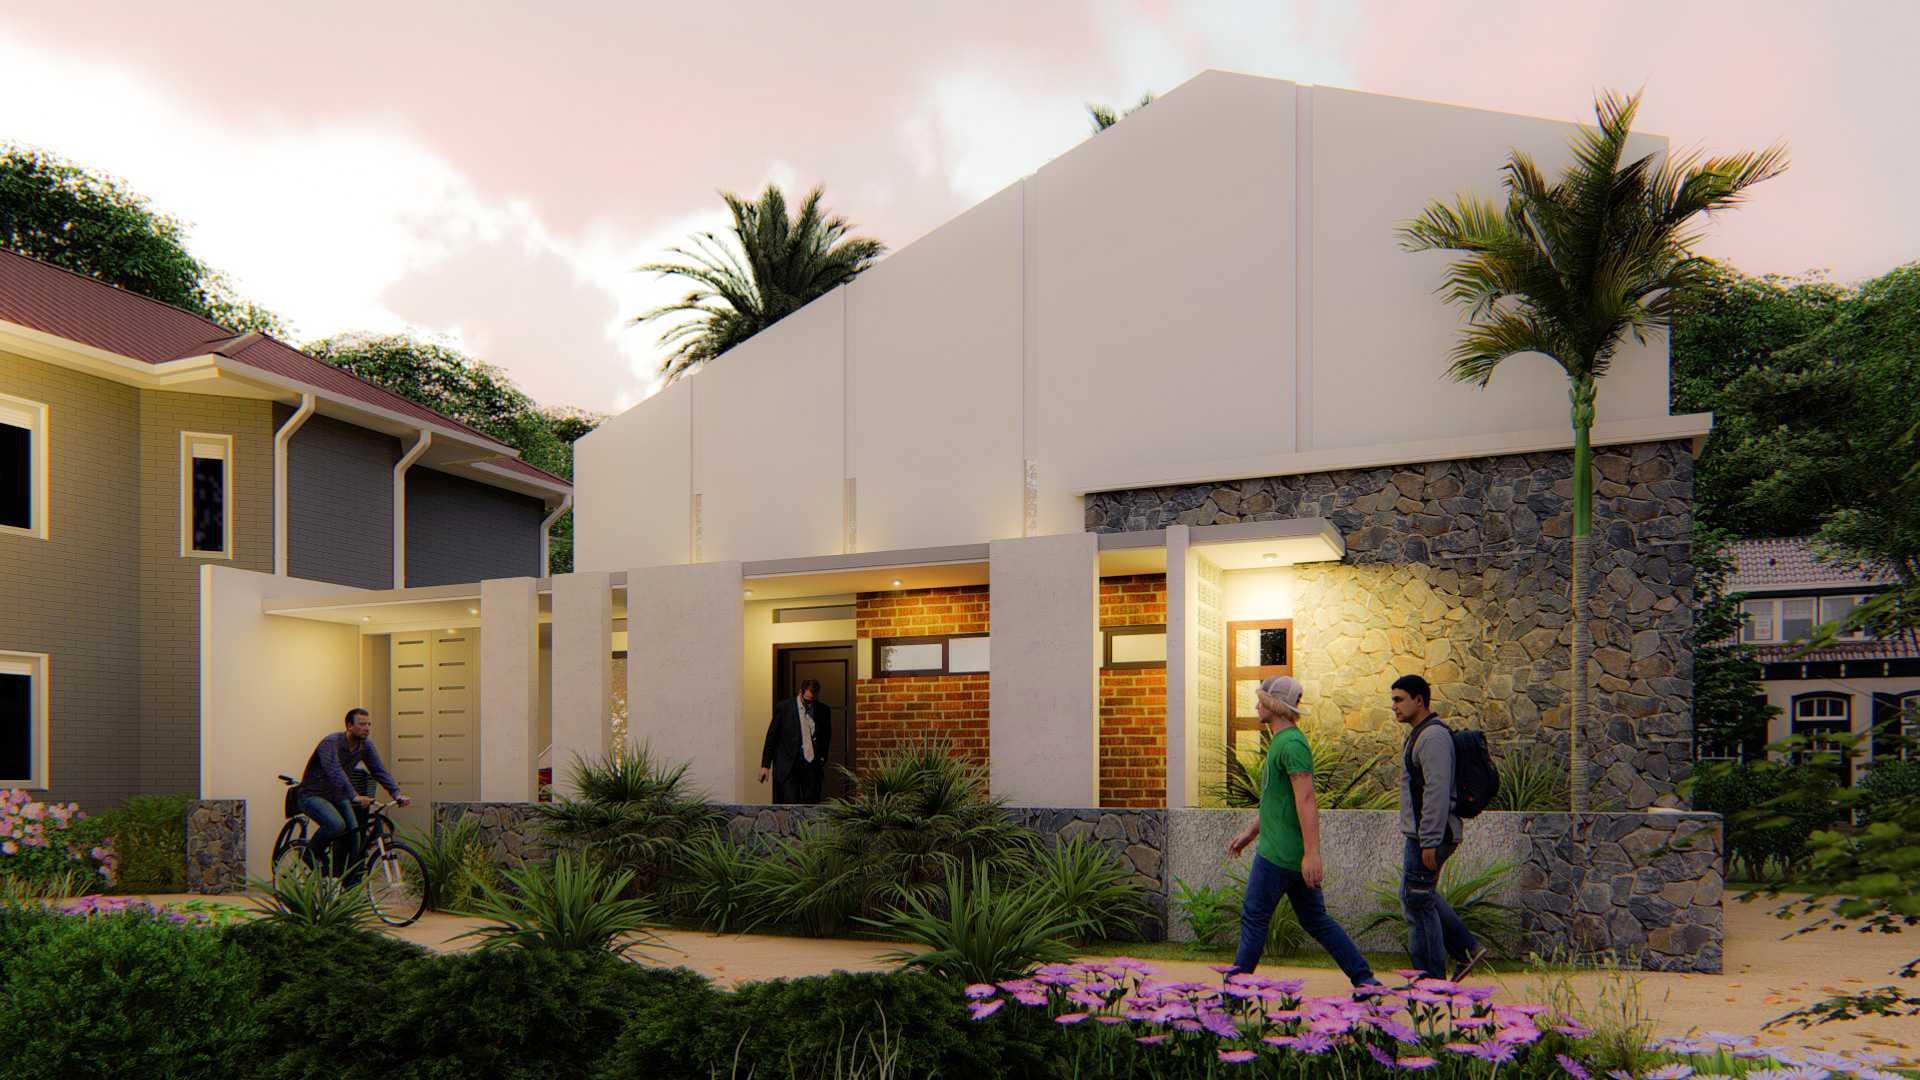 Nggambar Omah | Design And Build The Natunacorner Whitehouse Blitar, Kota Blitar, Jawa Timur, Indonesia Blitar, Kota Blitar, Jawa Timur, Indonesia Nggambar-Omah-Design-And-Build-The-Natunacorner-Whitehouse  55701